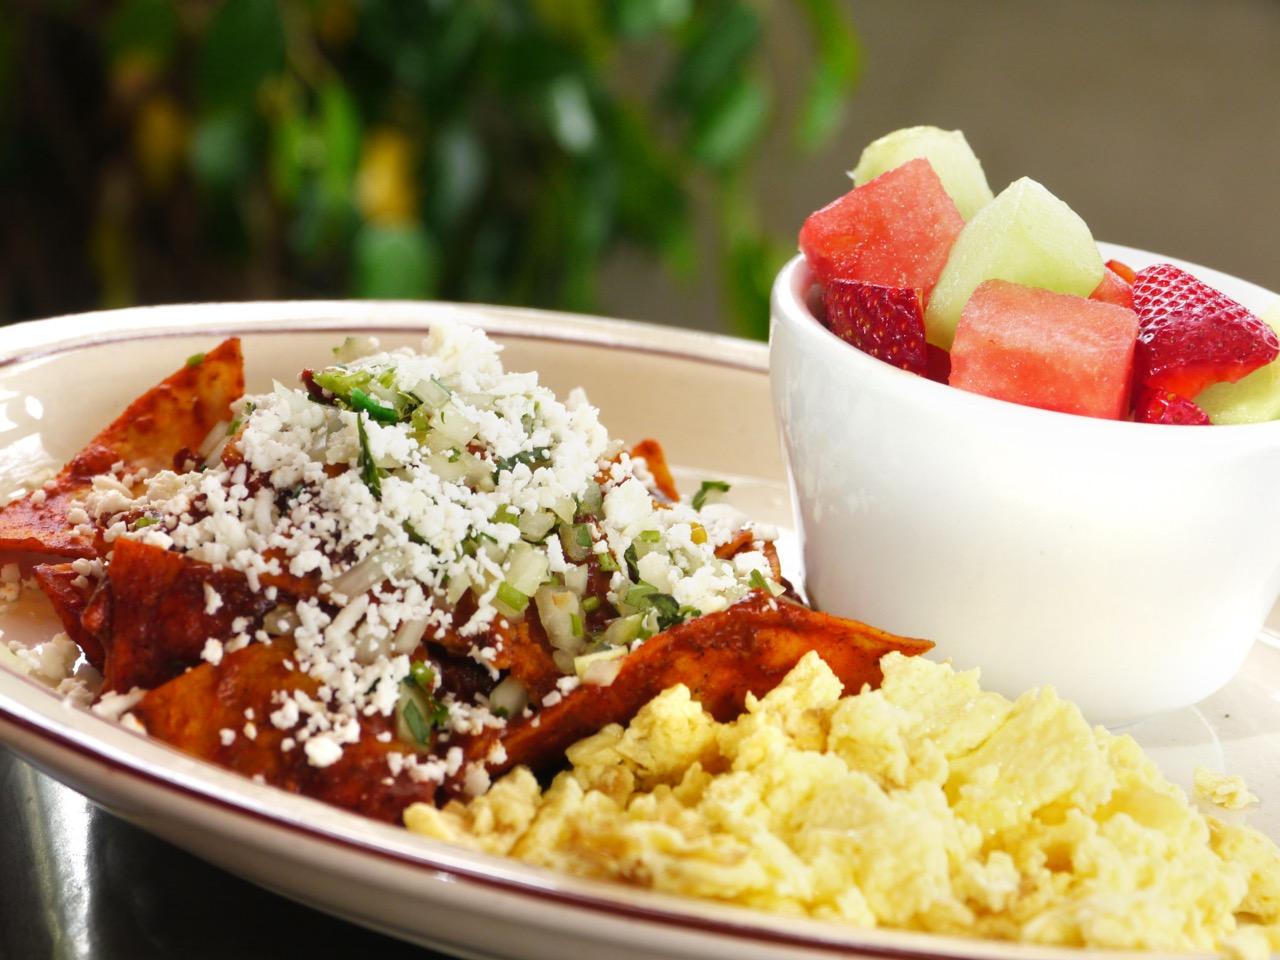 mexican-food-la-canada - 16